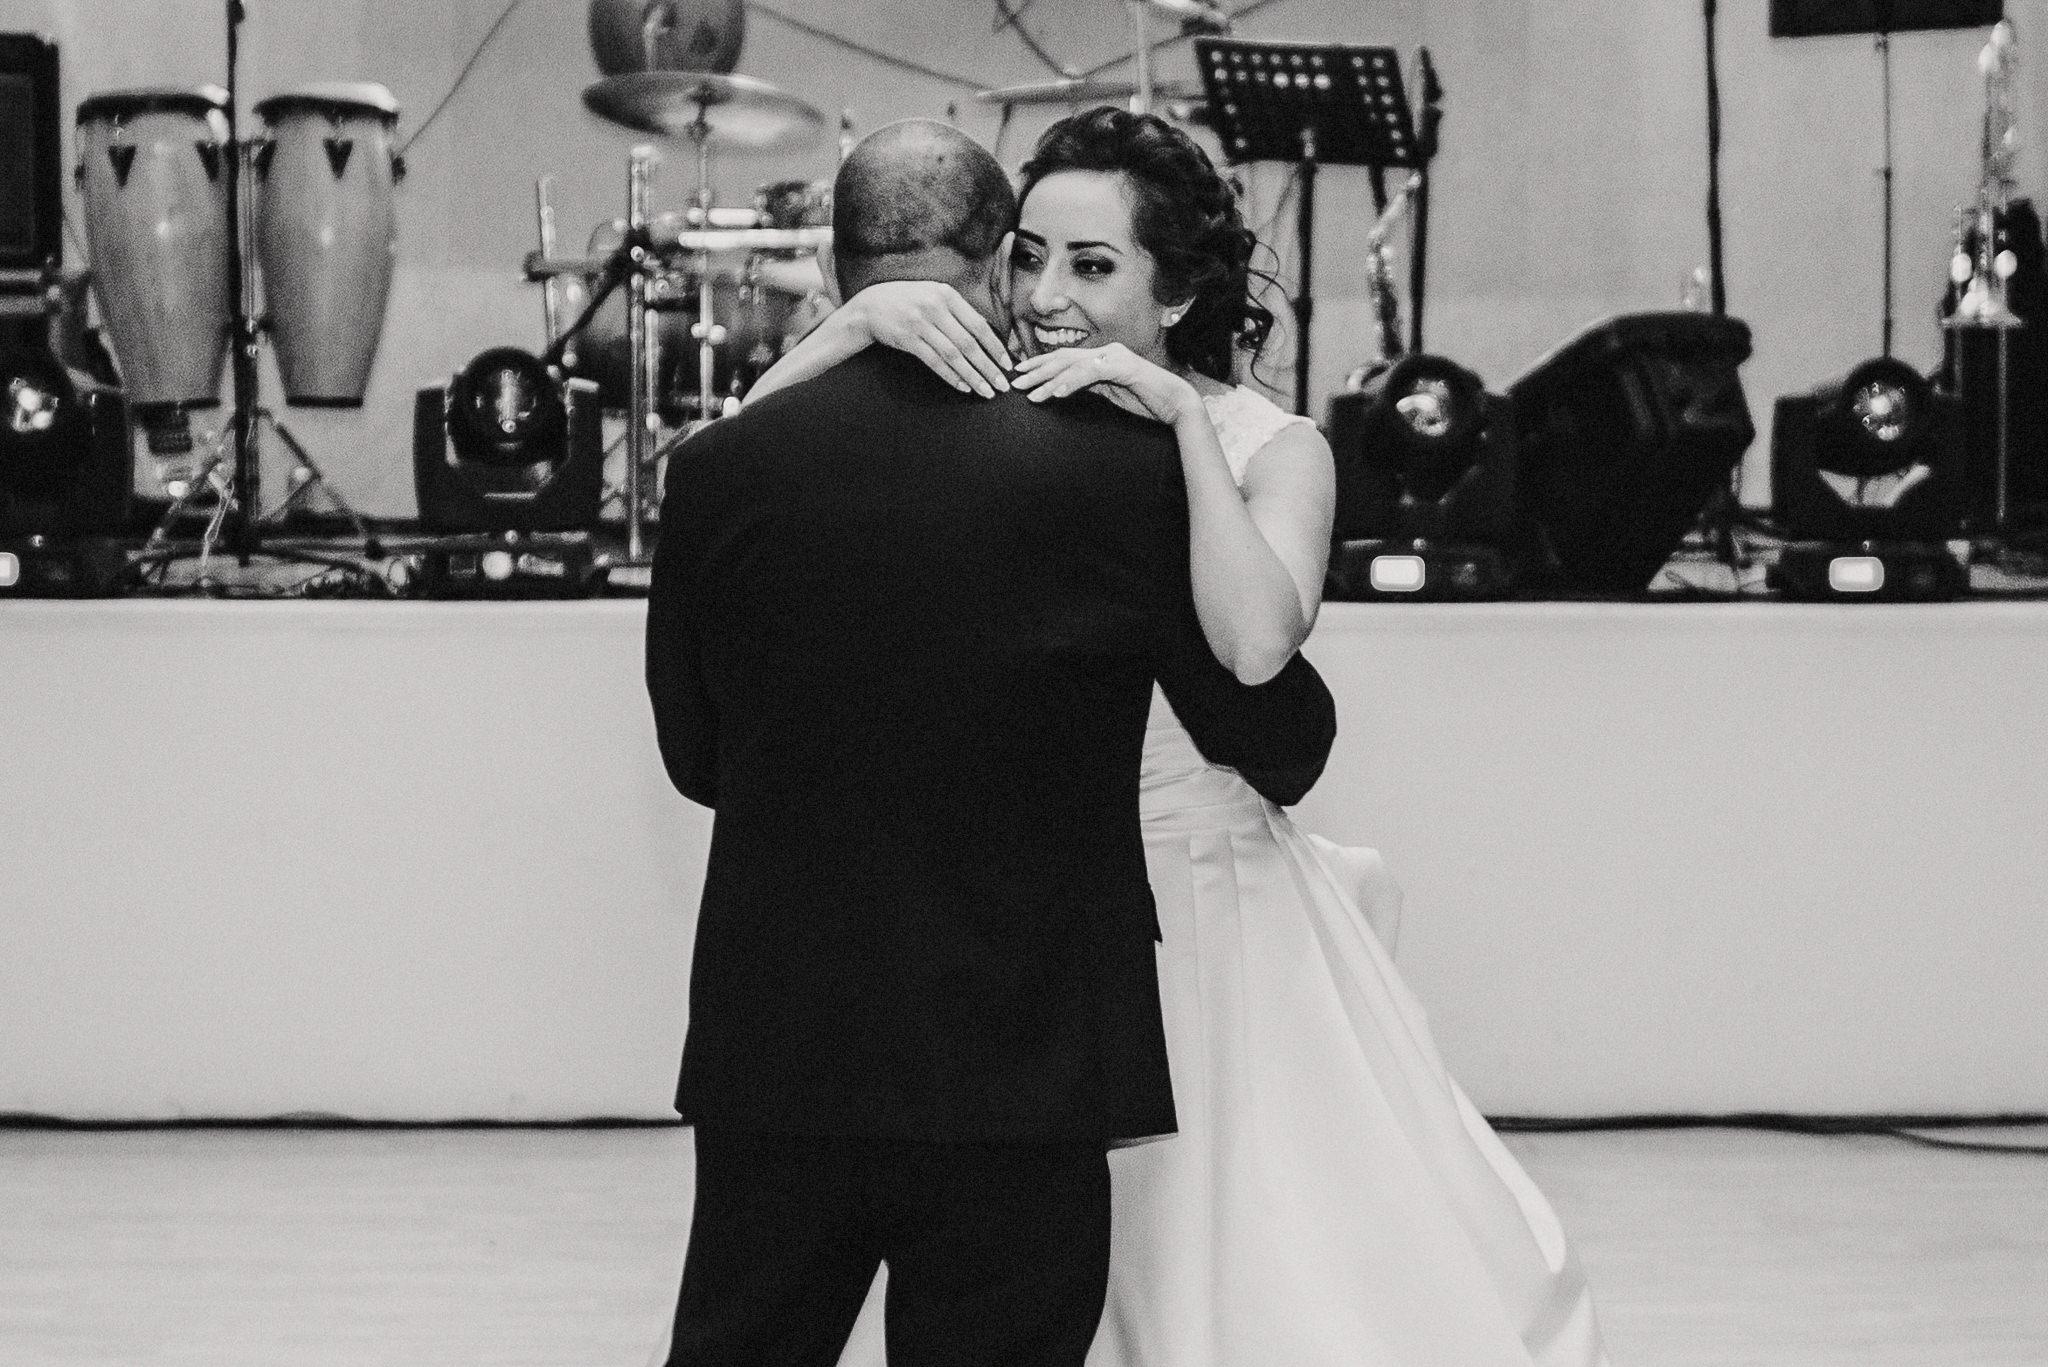 Wedding-Boda-Tulancingo-Hidalgo-Salon-Essenzia-Luis-Houdin-48-film